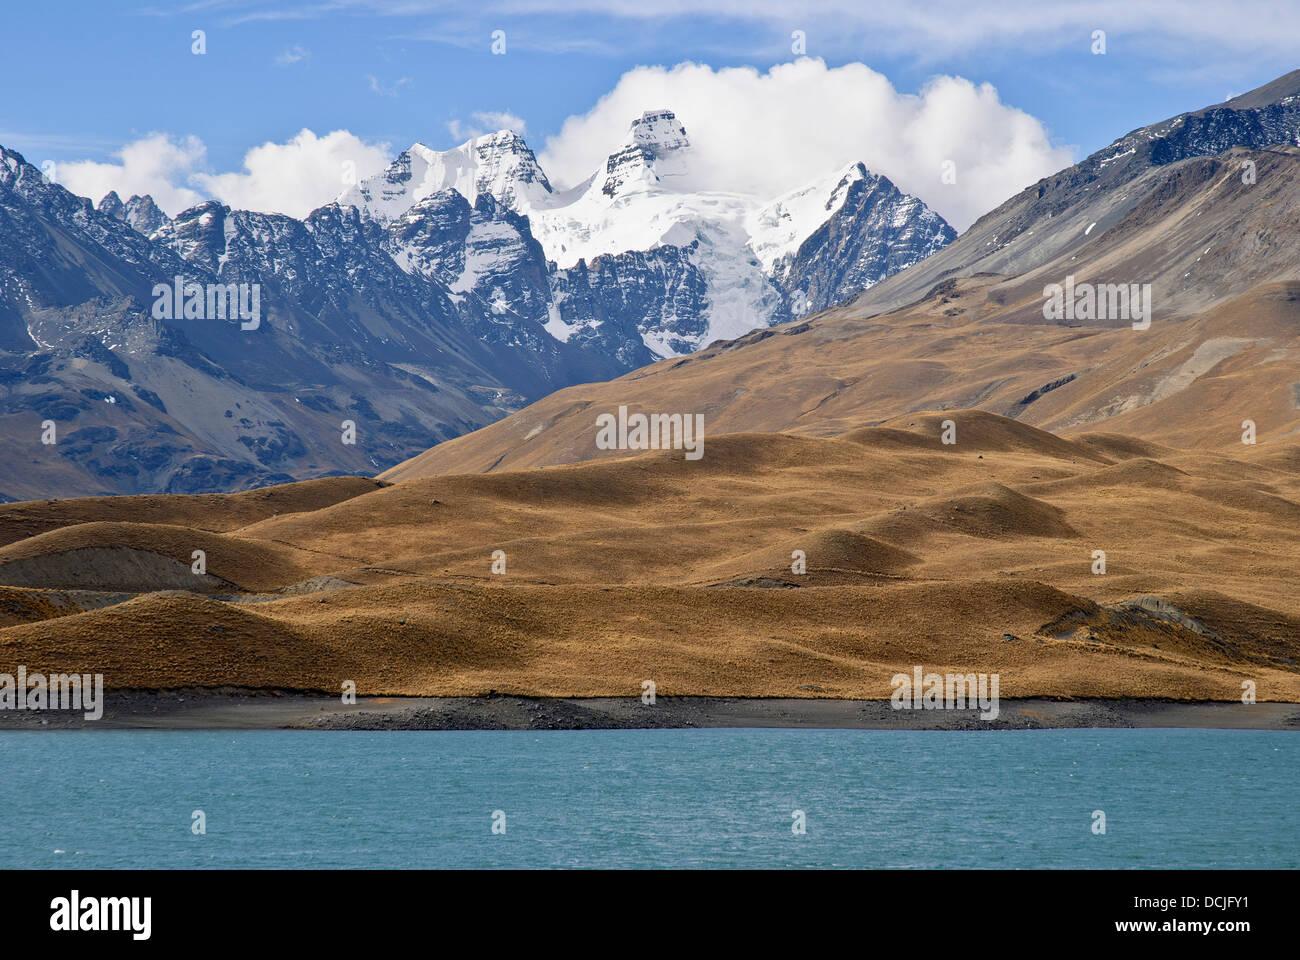 Mount Condoriri - Stock Image